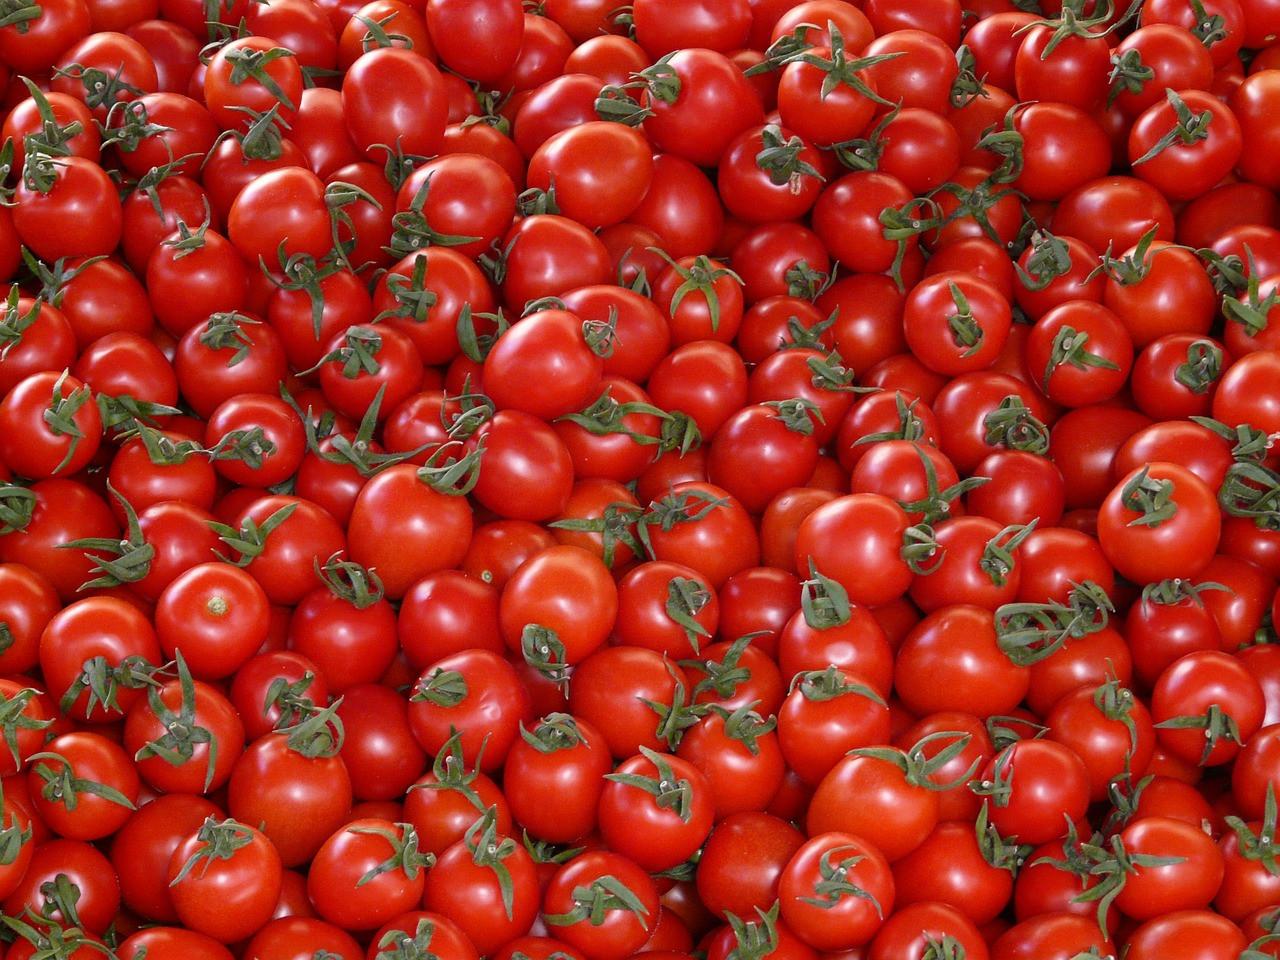 tomatoes-73912_1280.jpg